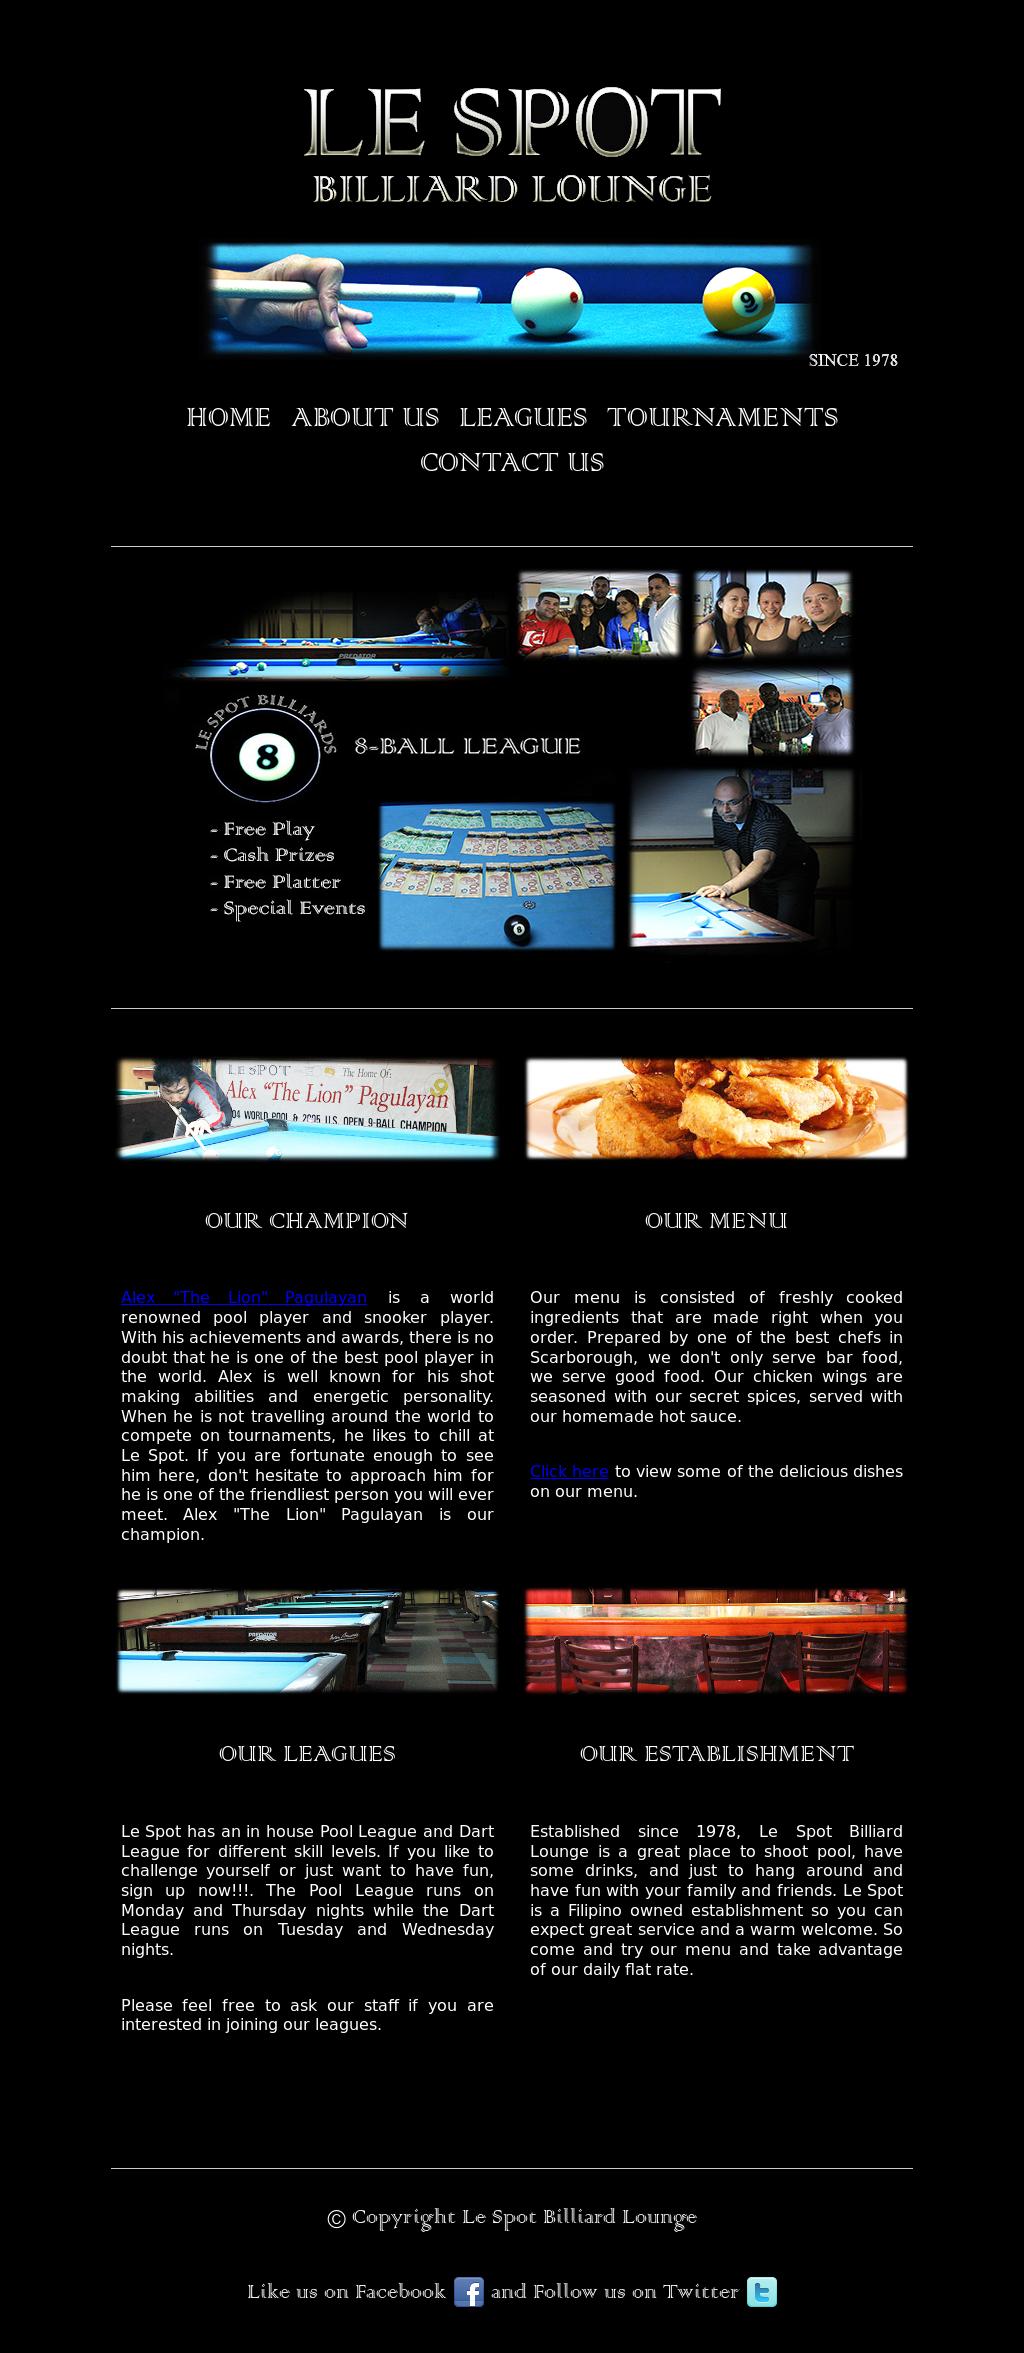 Le Spot Billiard Lounge Competitors, Revenue and Employees